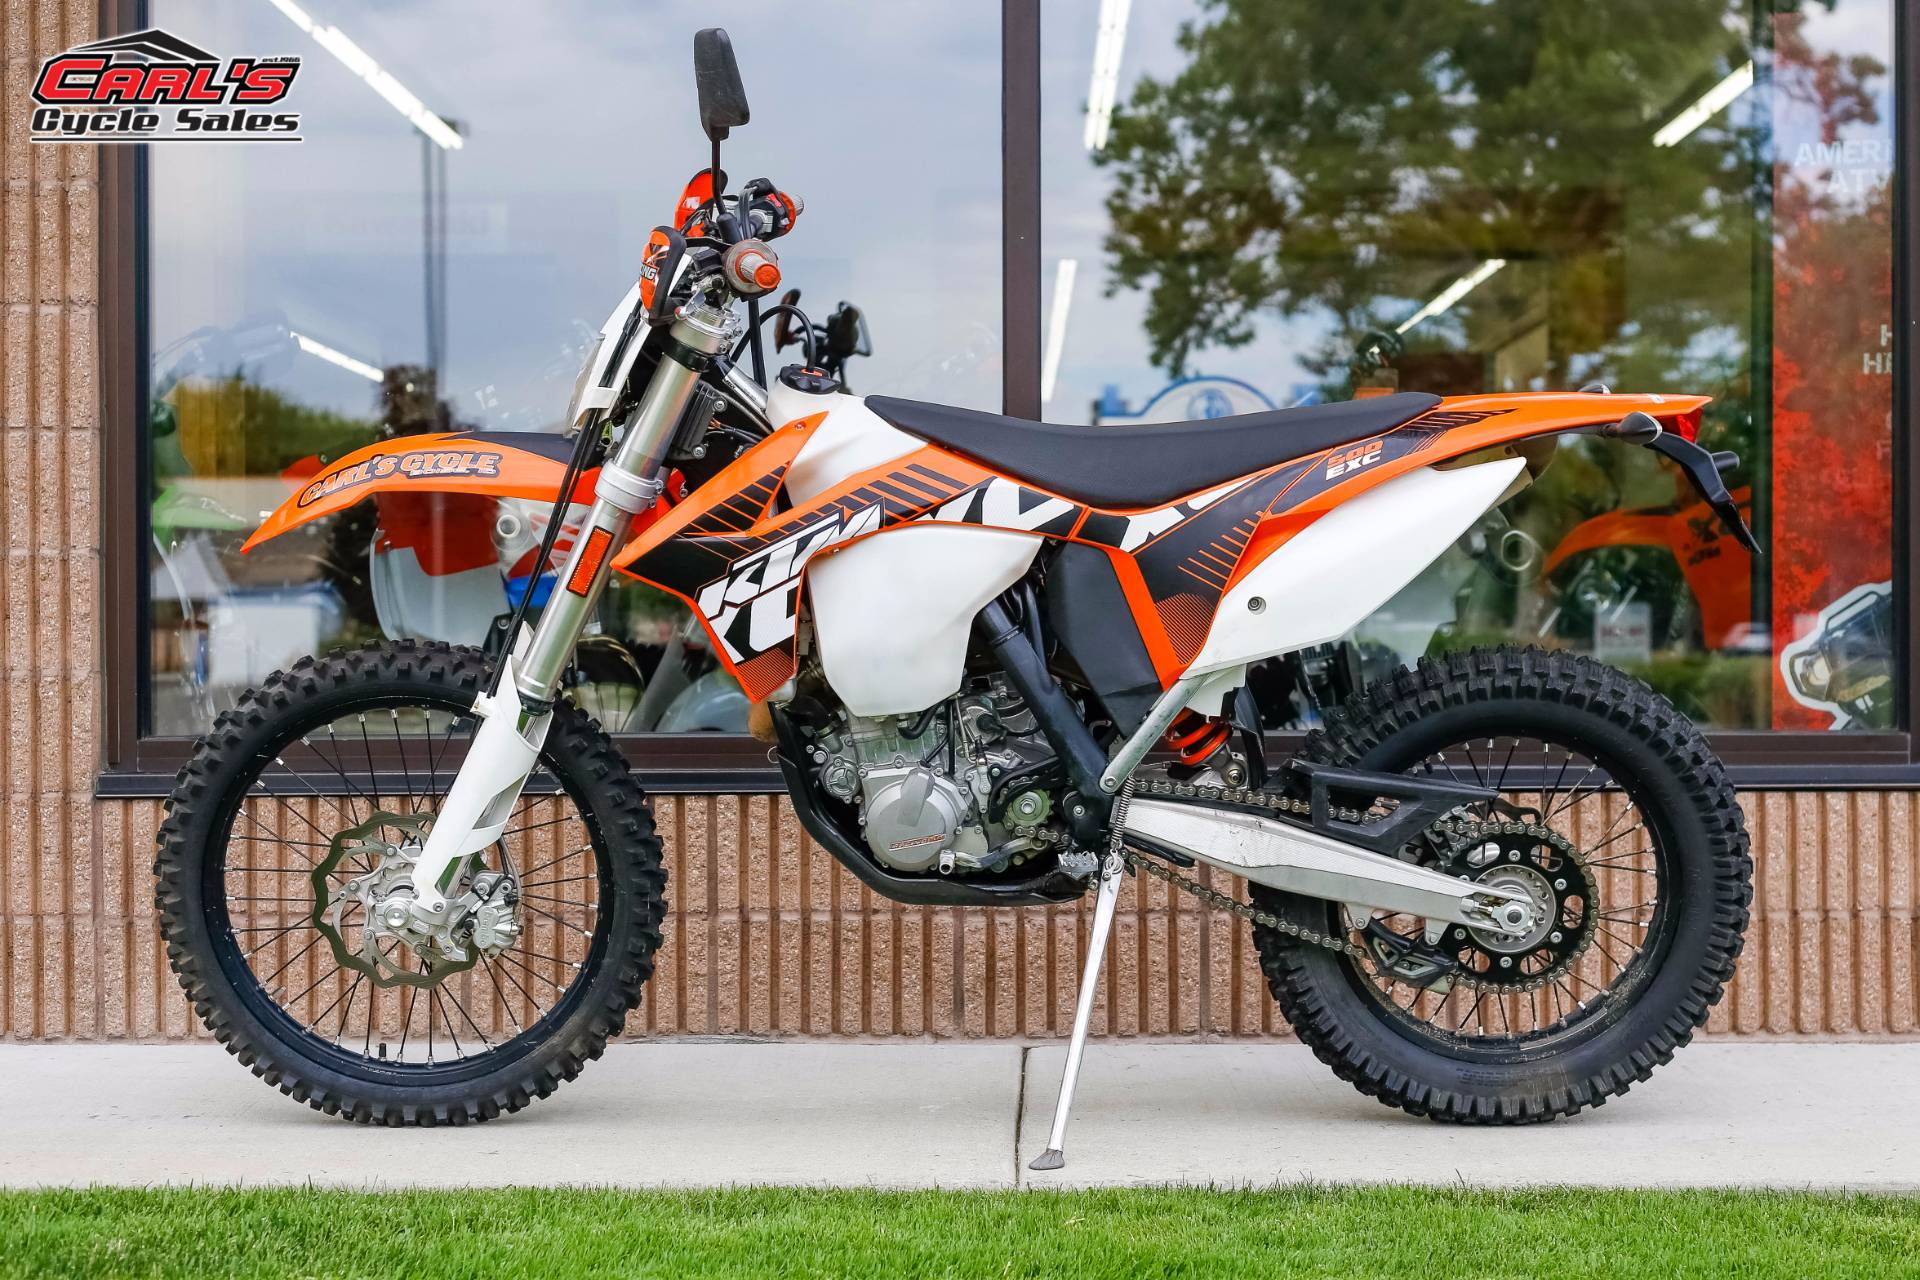 2012 500 EXC